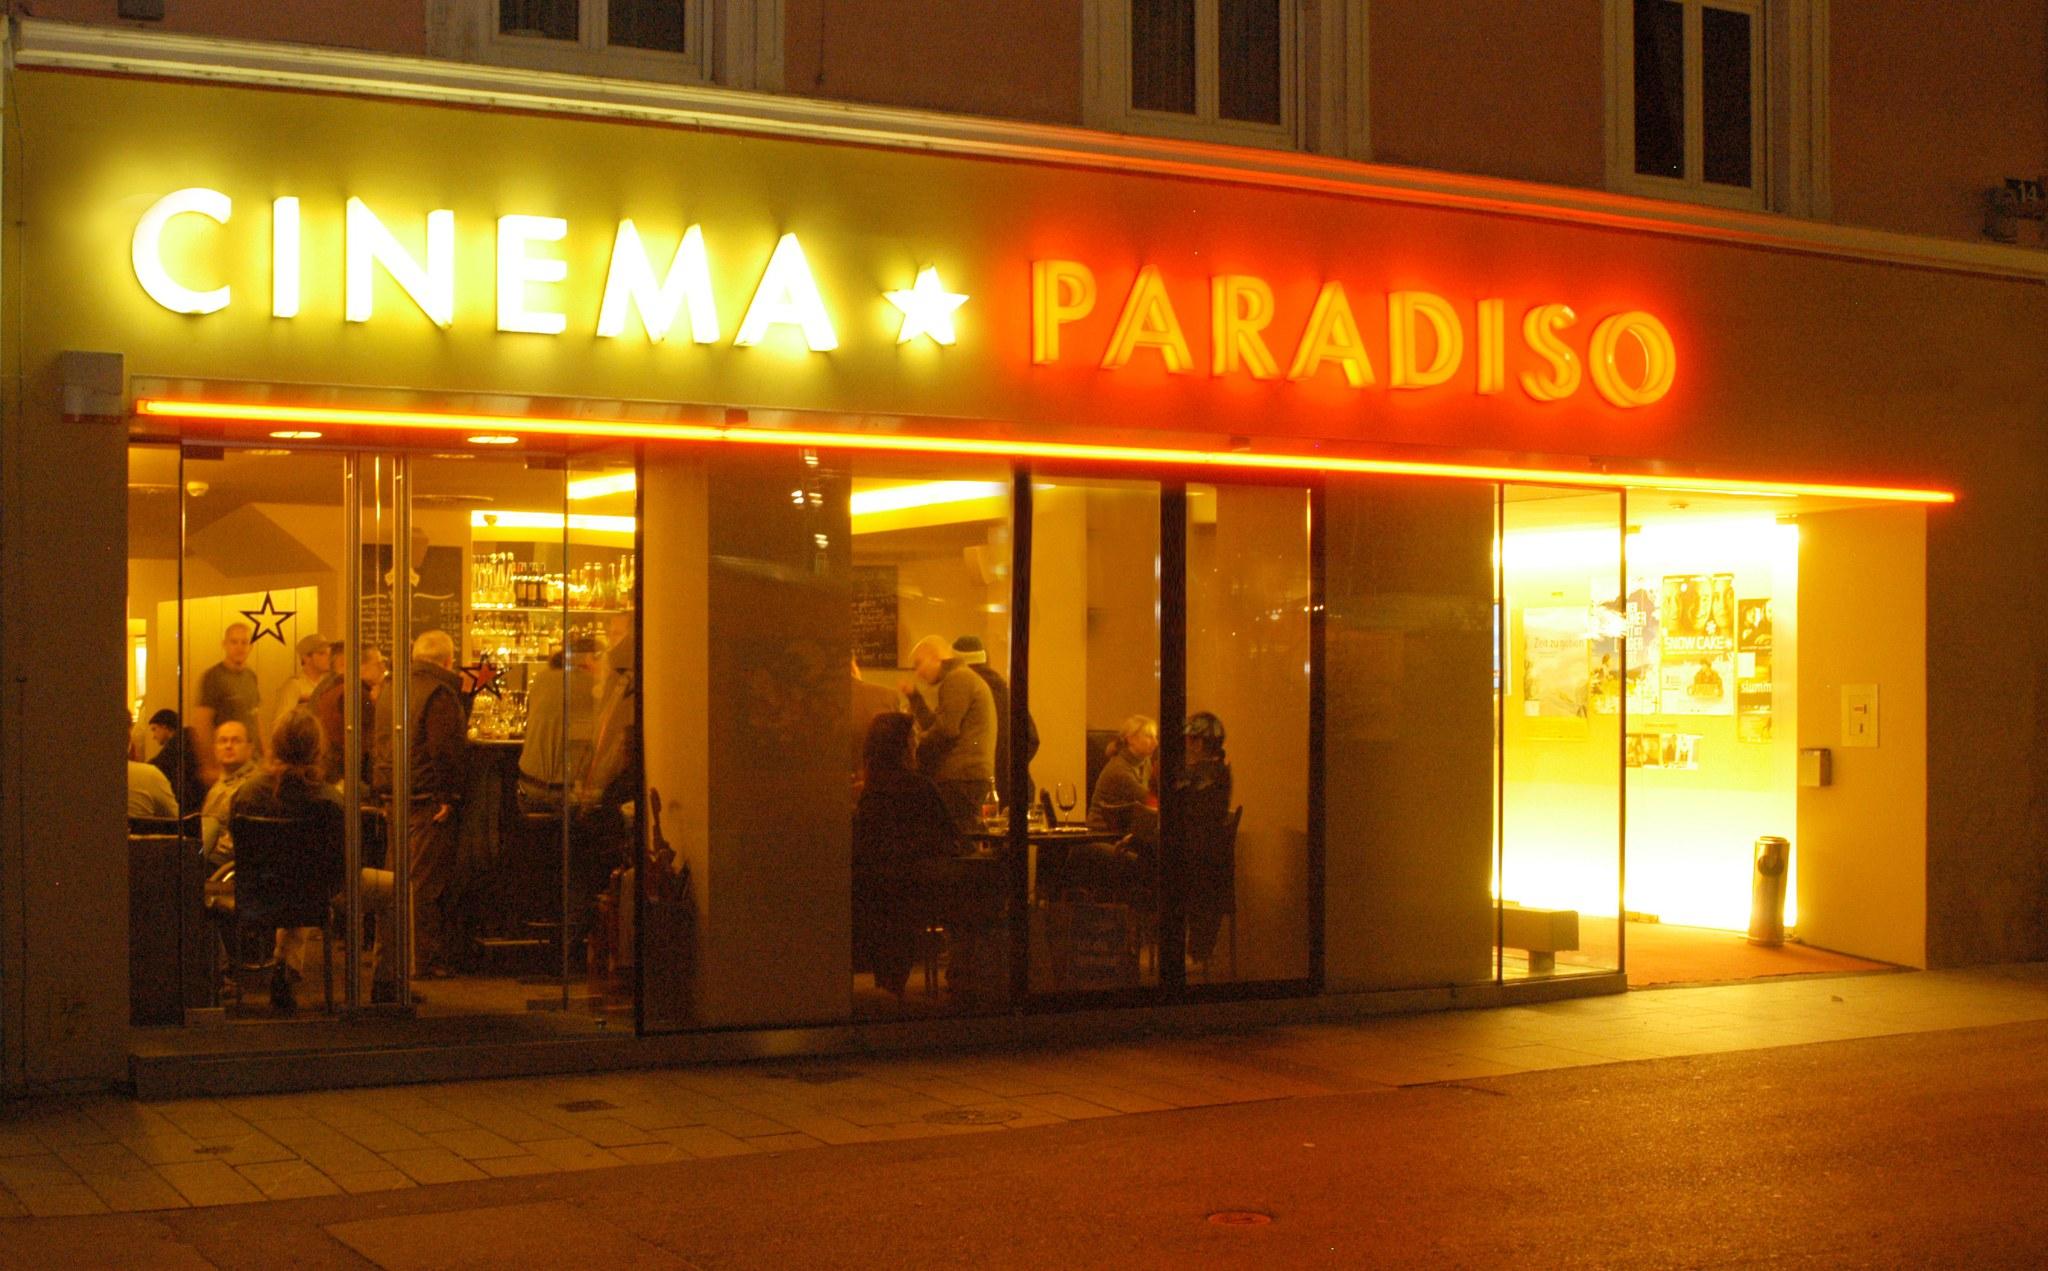 © cinema paradiso andrea reischer